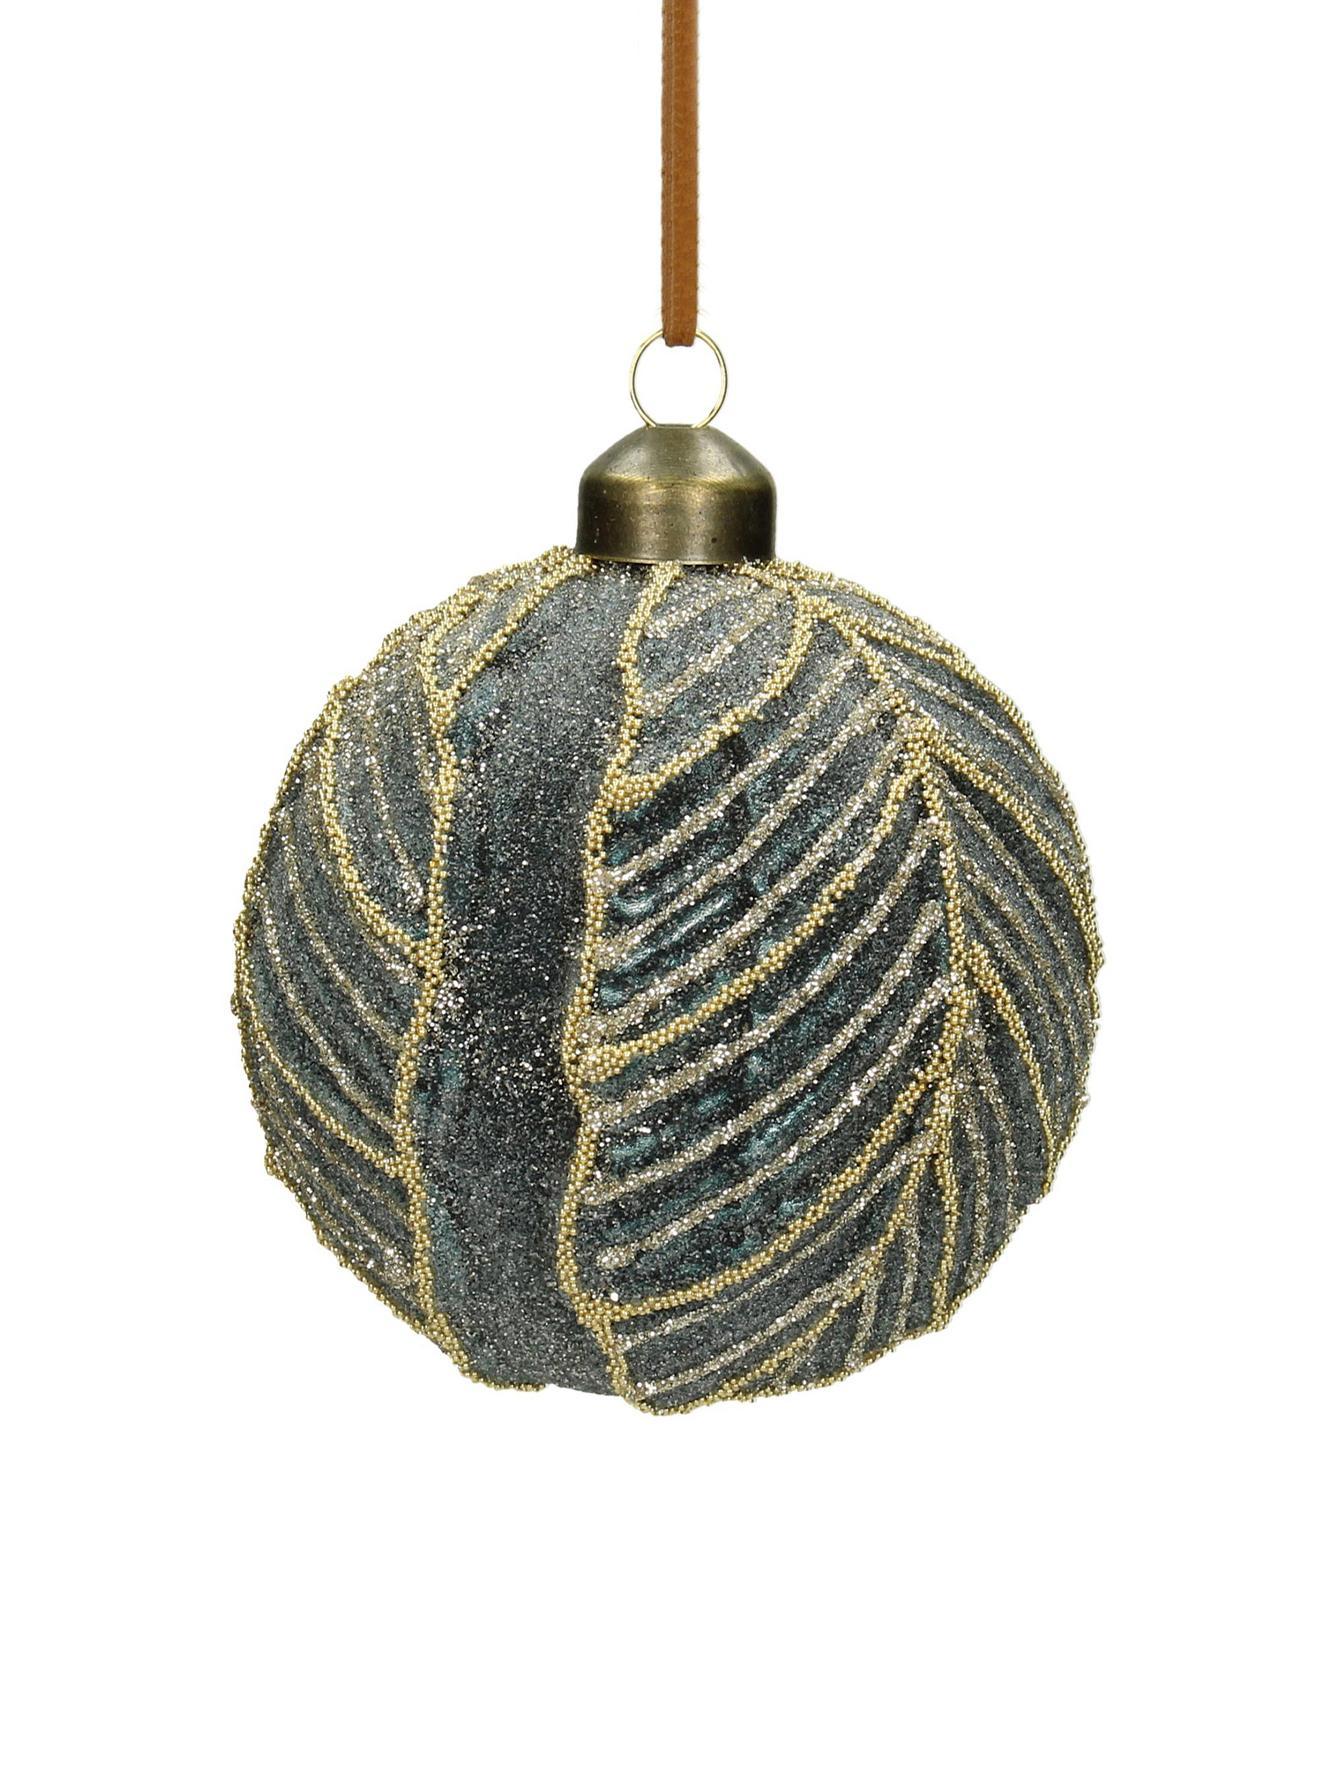 Palla di Natale Leaf Ø 8 cm, 2 pz, Vetro, poliestere, materiale sintetico, Grigio blu, Ø 8 cm